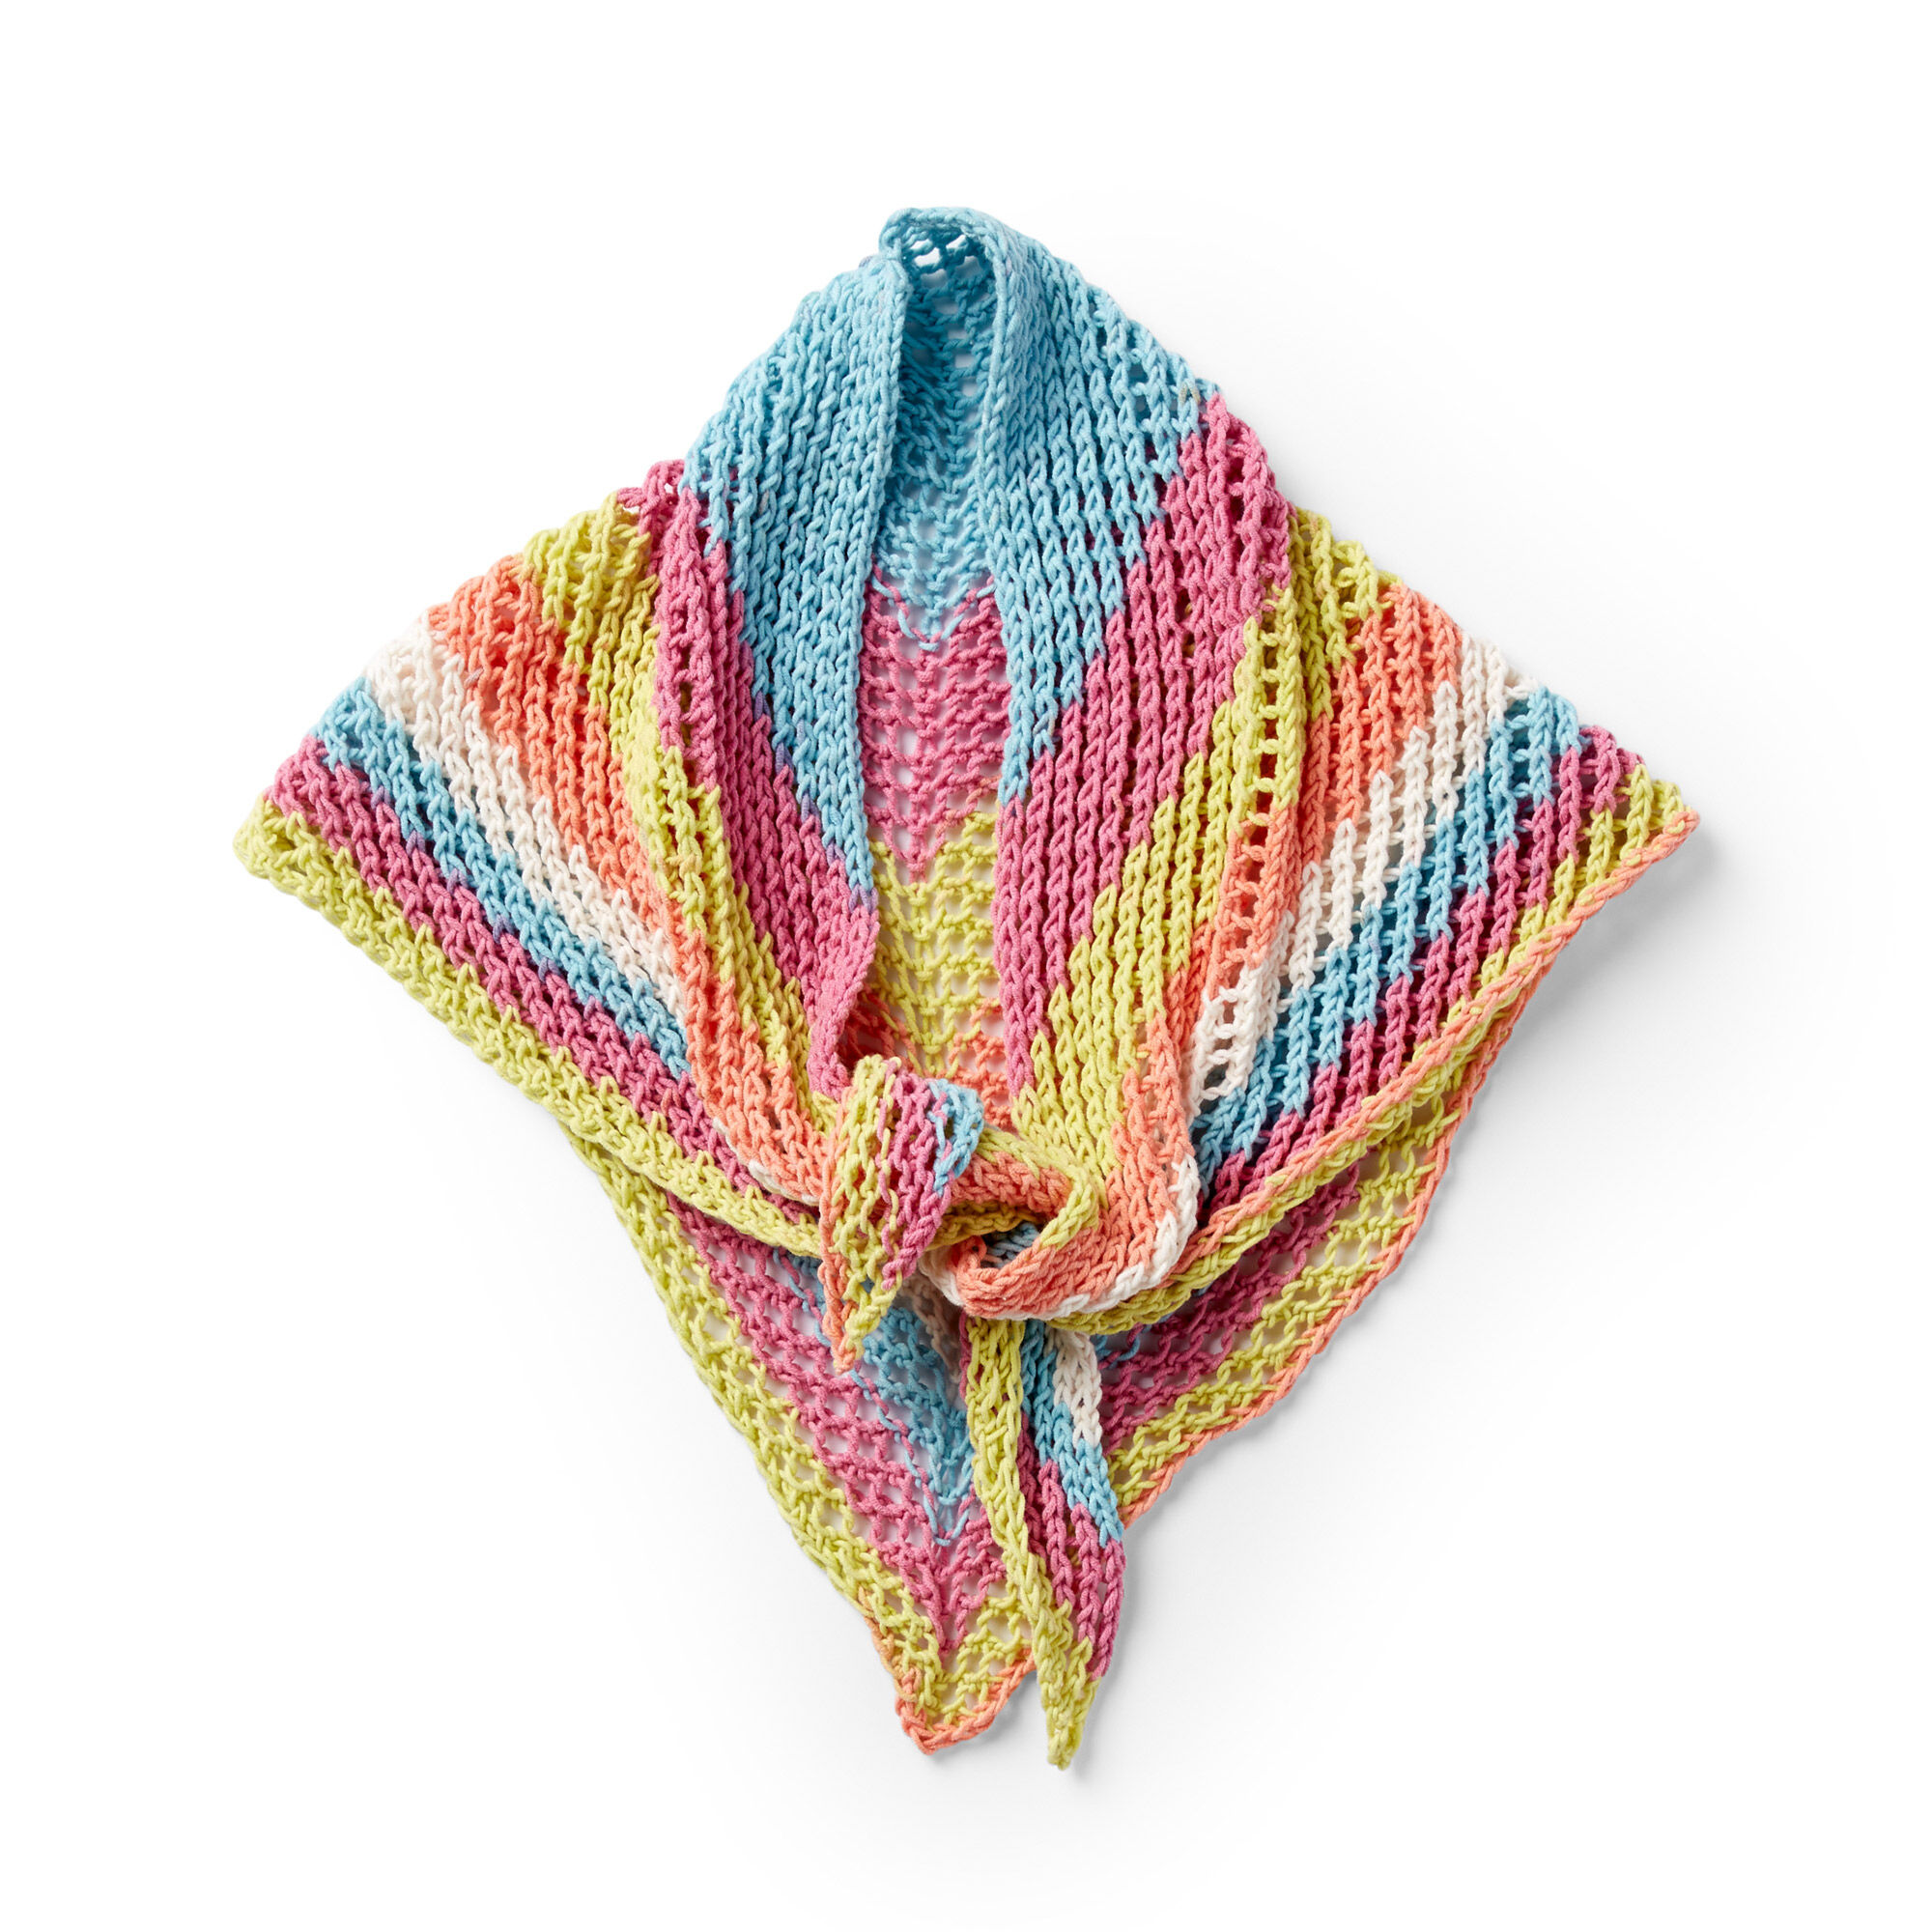 Caron Triangular Knit Shawl Pattern | Yarnspirations